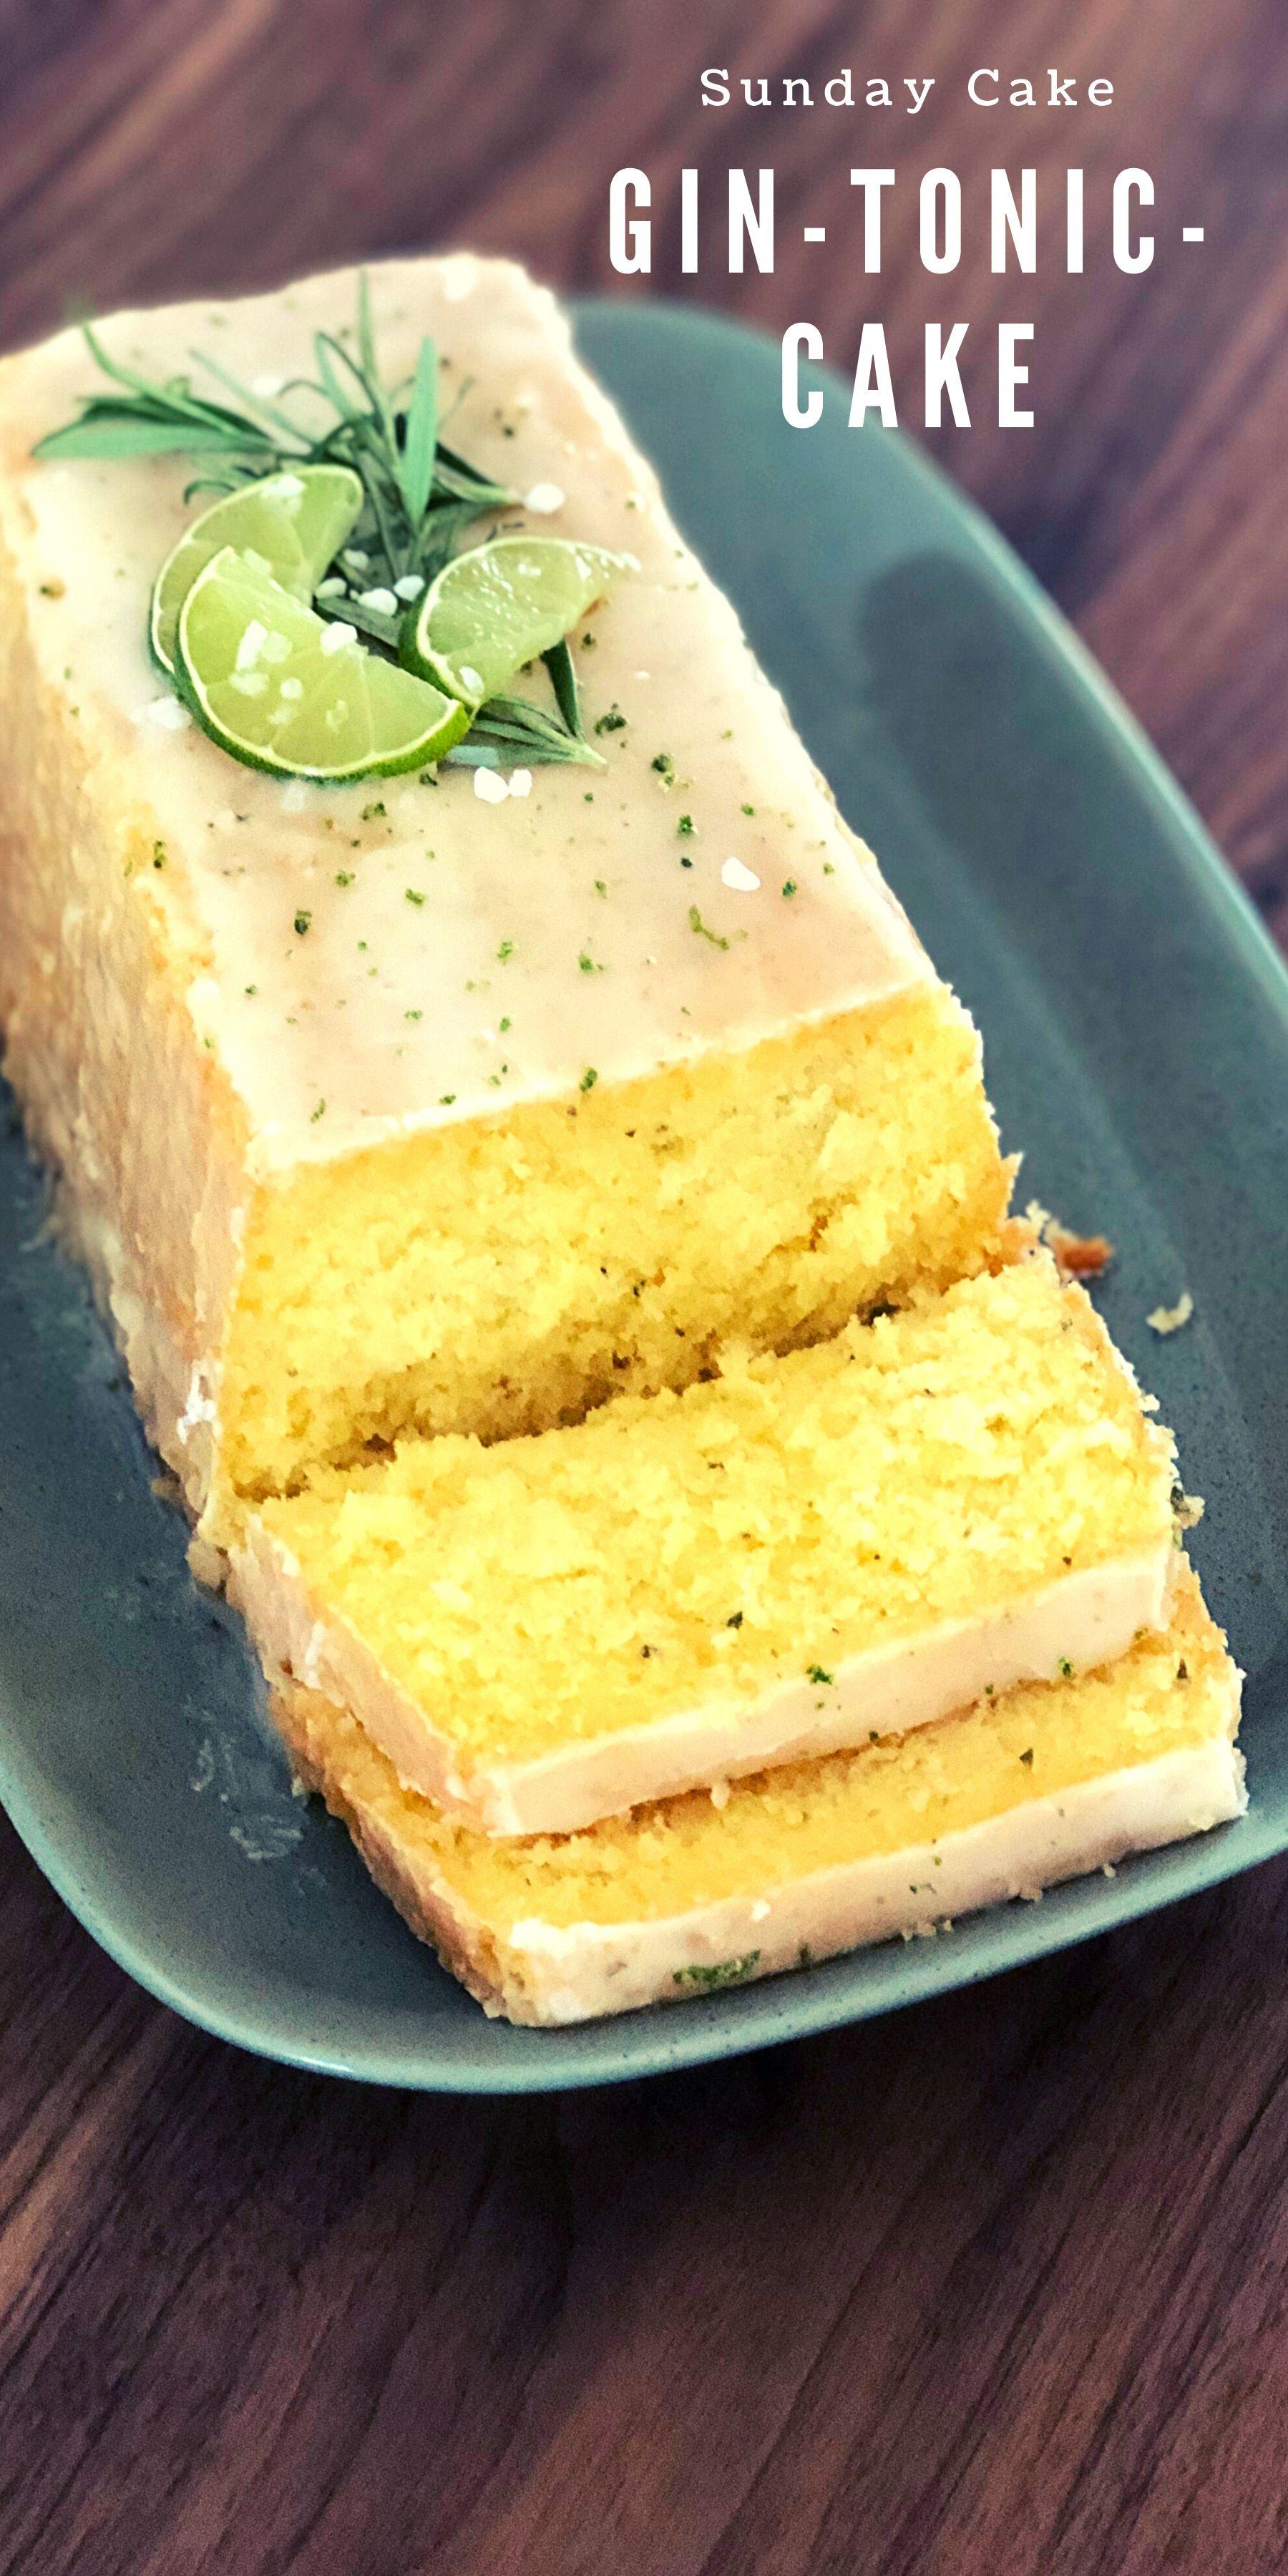 Gin Tonic Cake Rezept Lebensmittel Essen Gin Und Tonic Getranke Rezepte